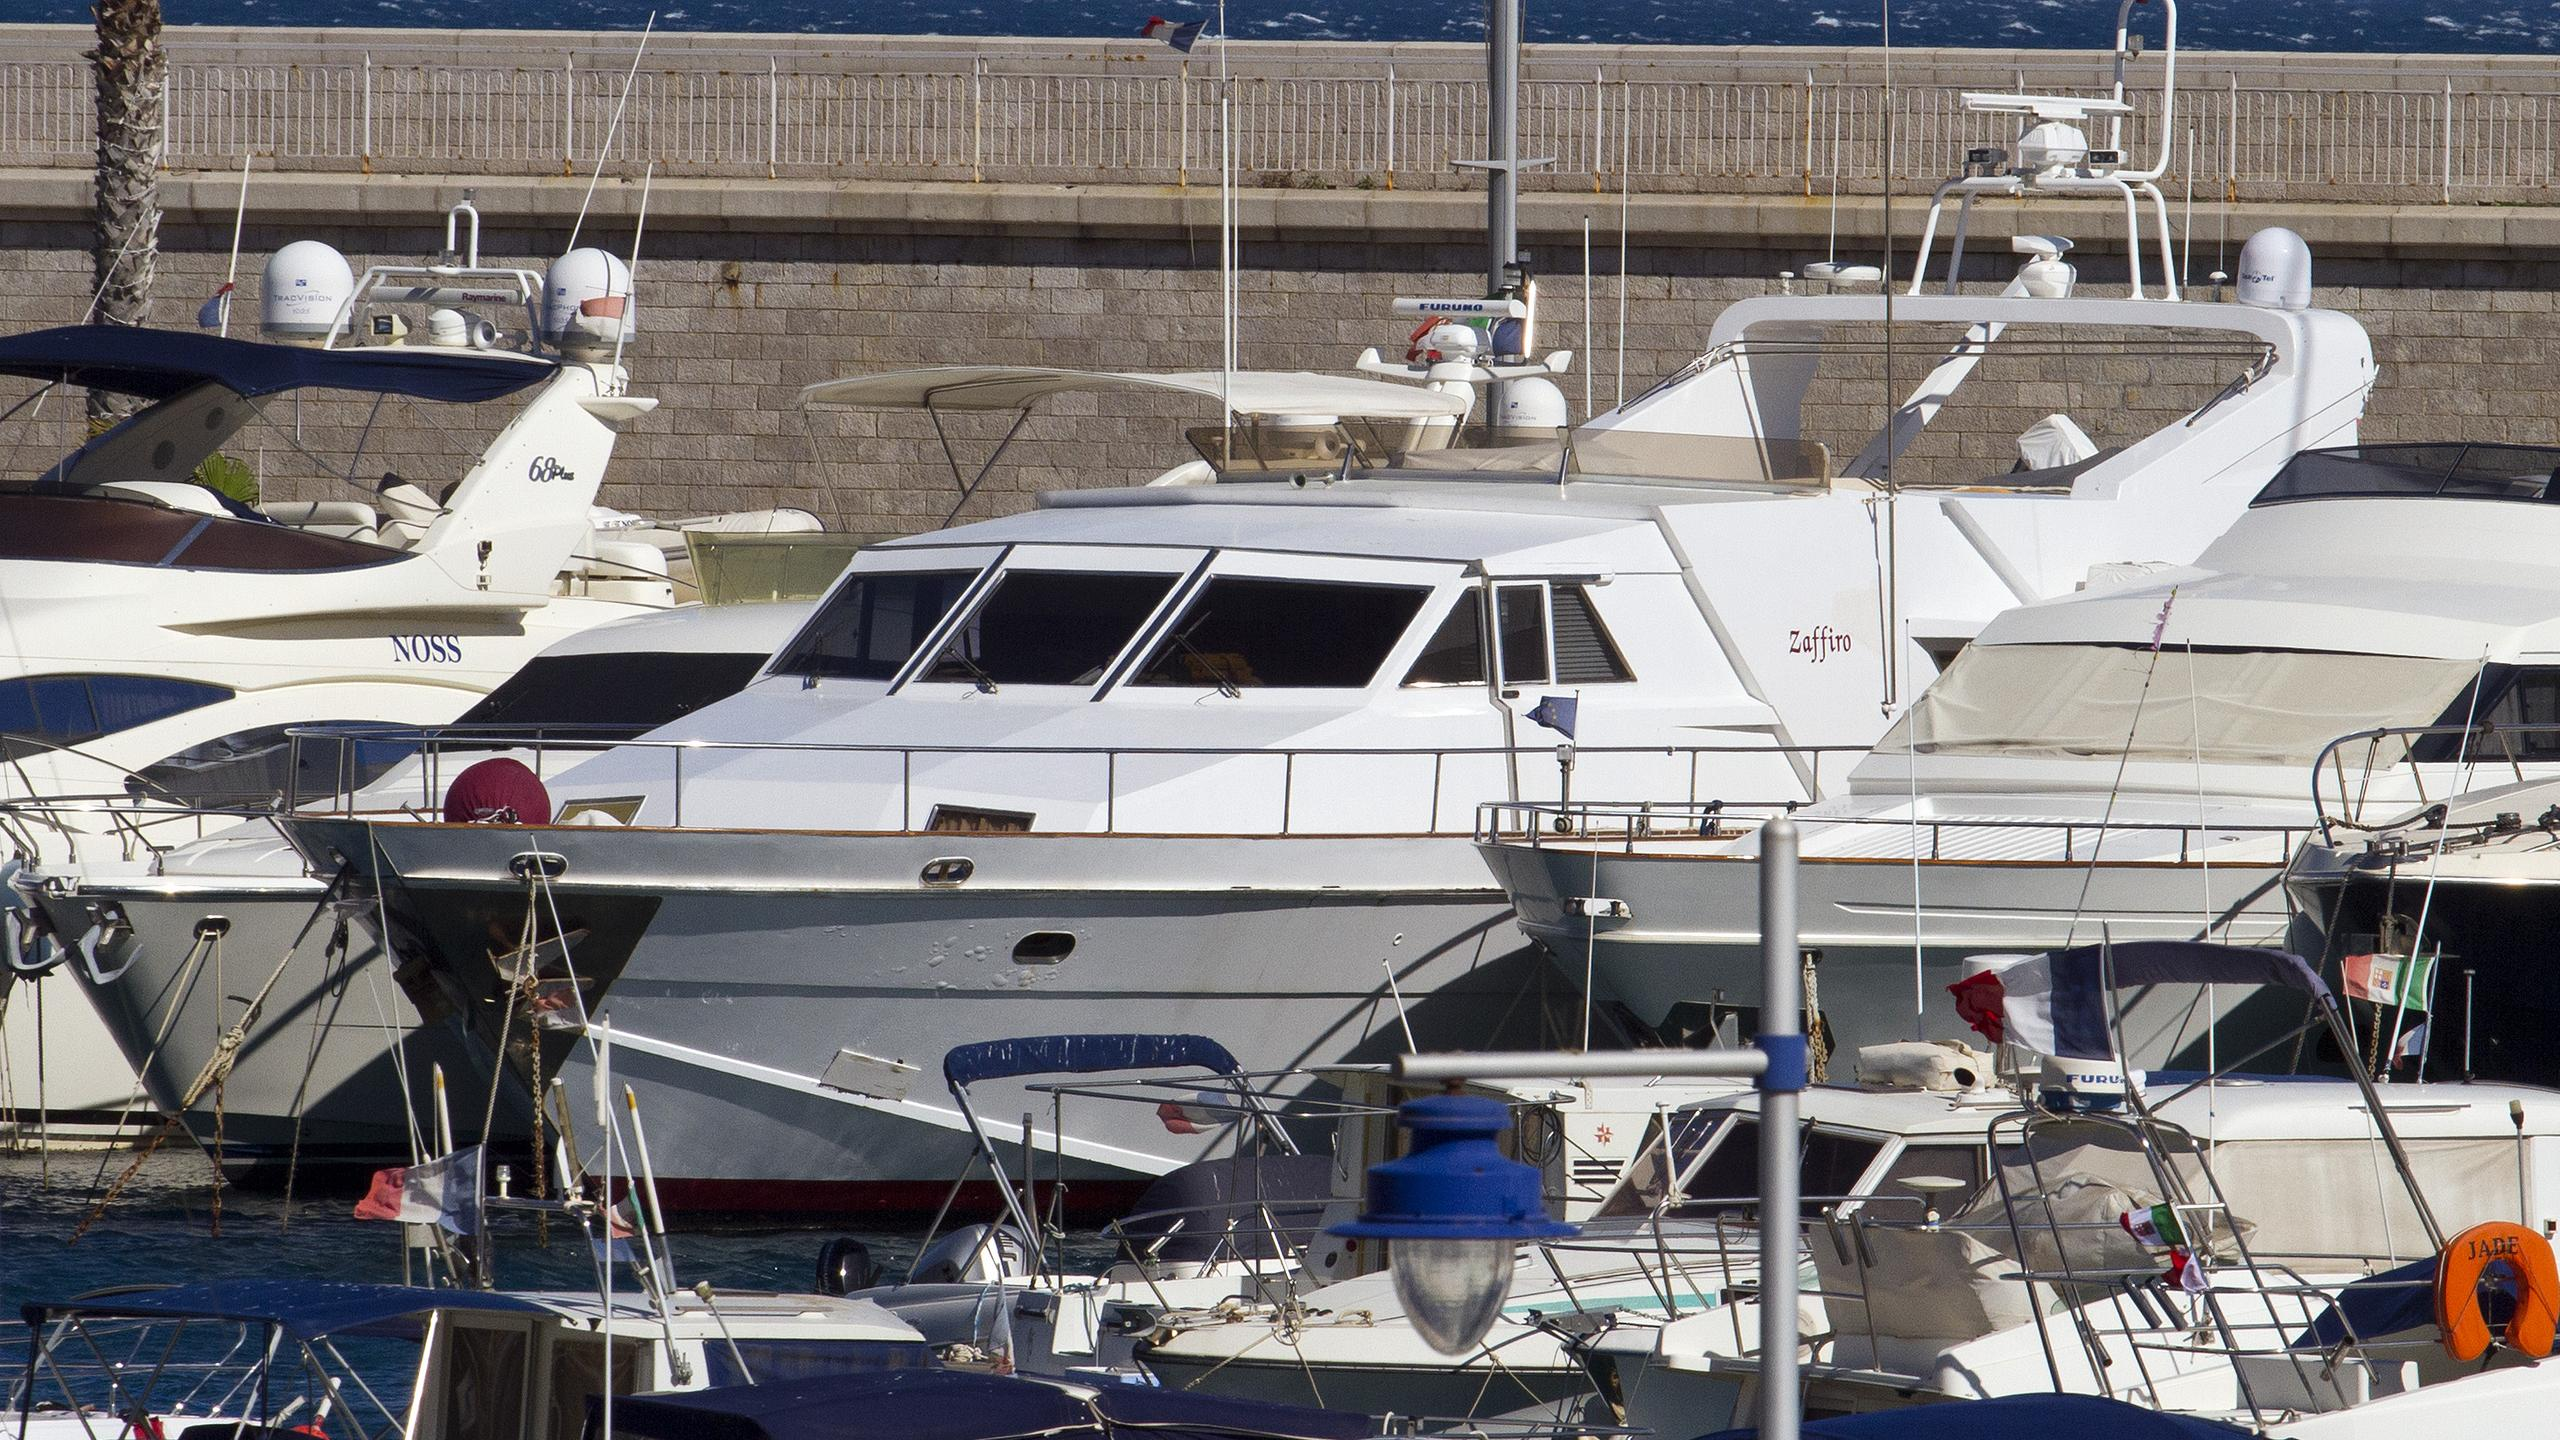 zaffiro-motor-yacht-canados-90-1974-26m-half-profile